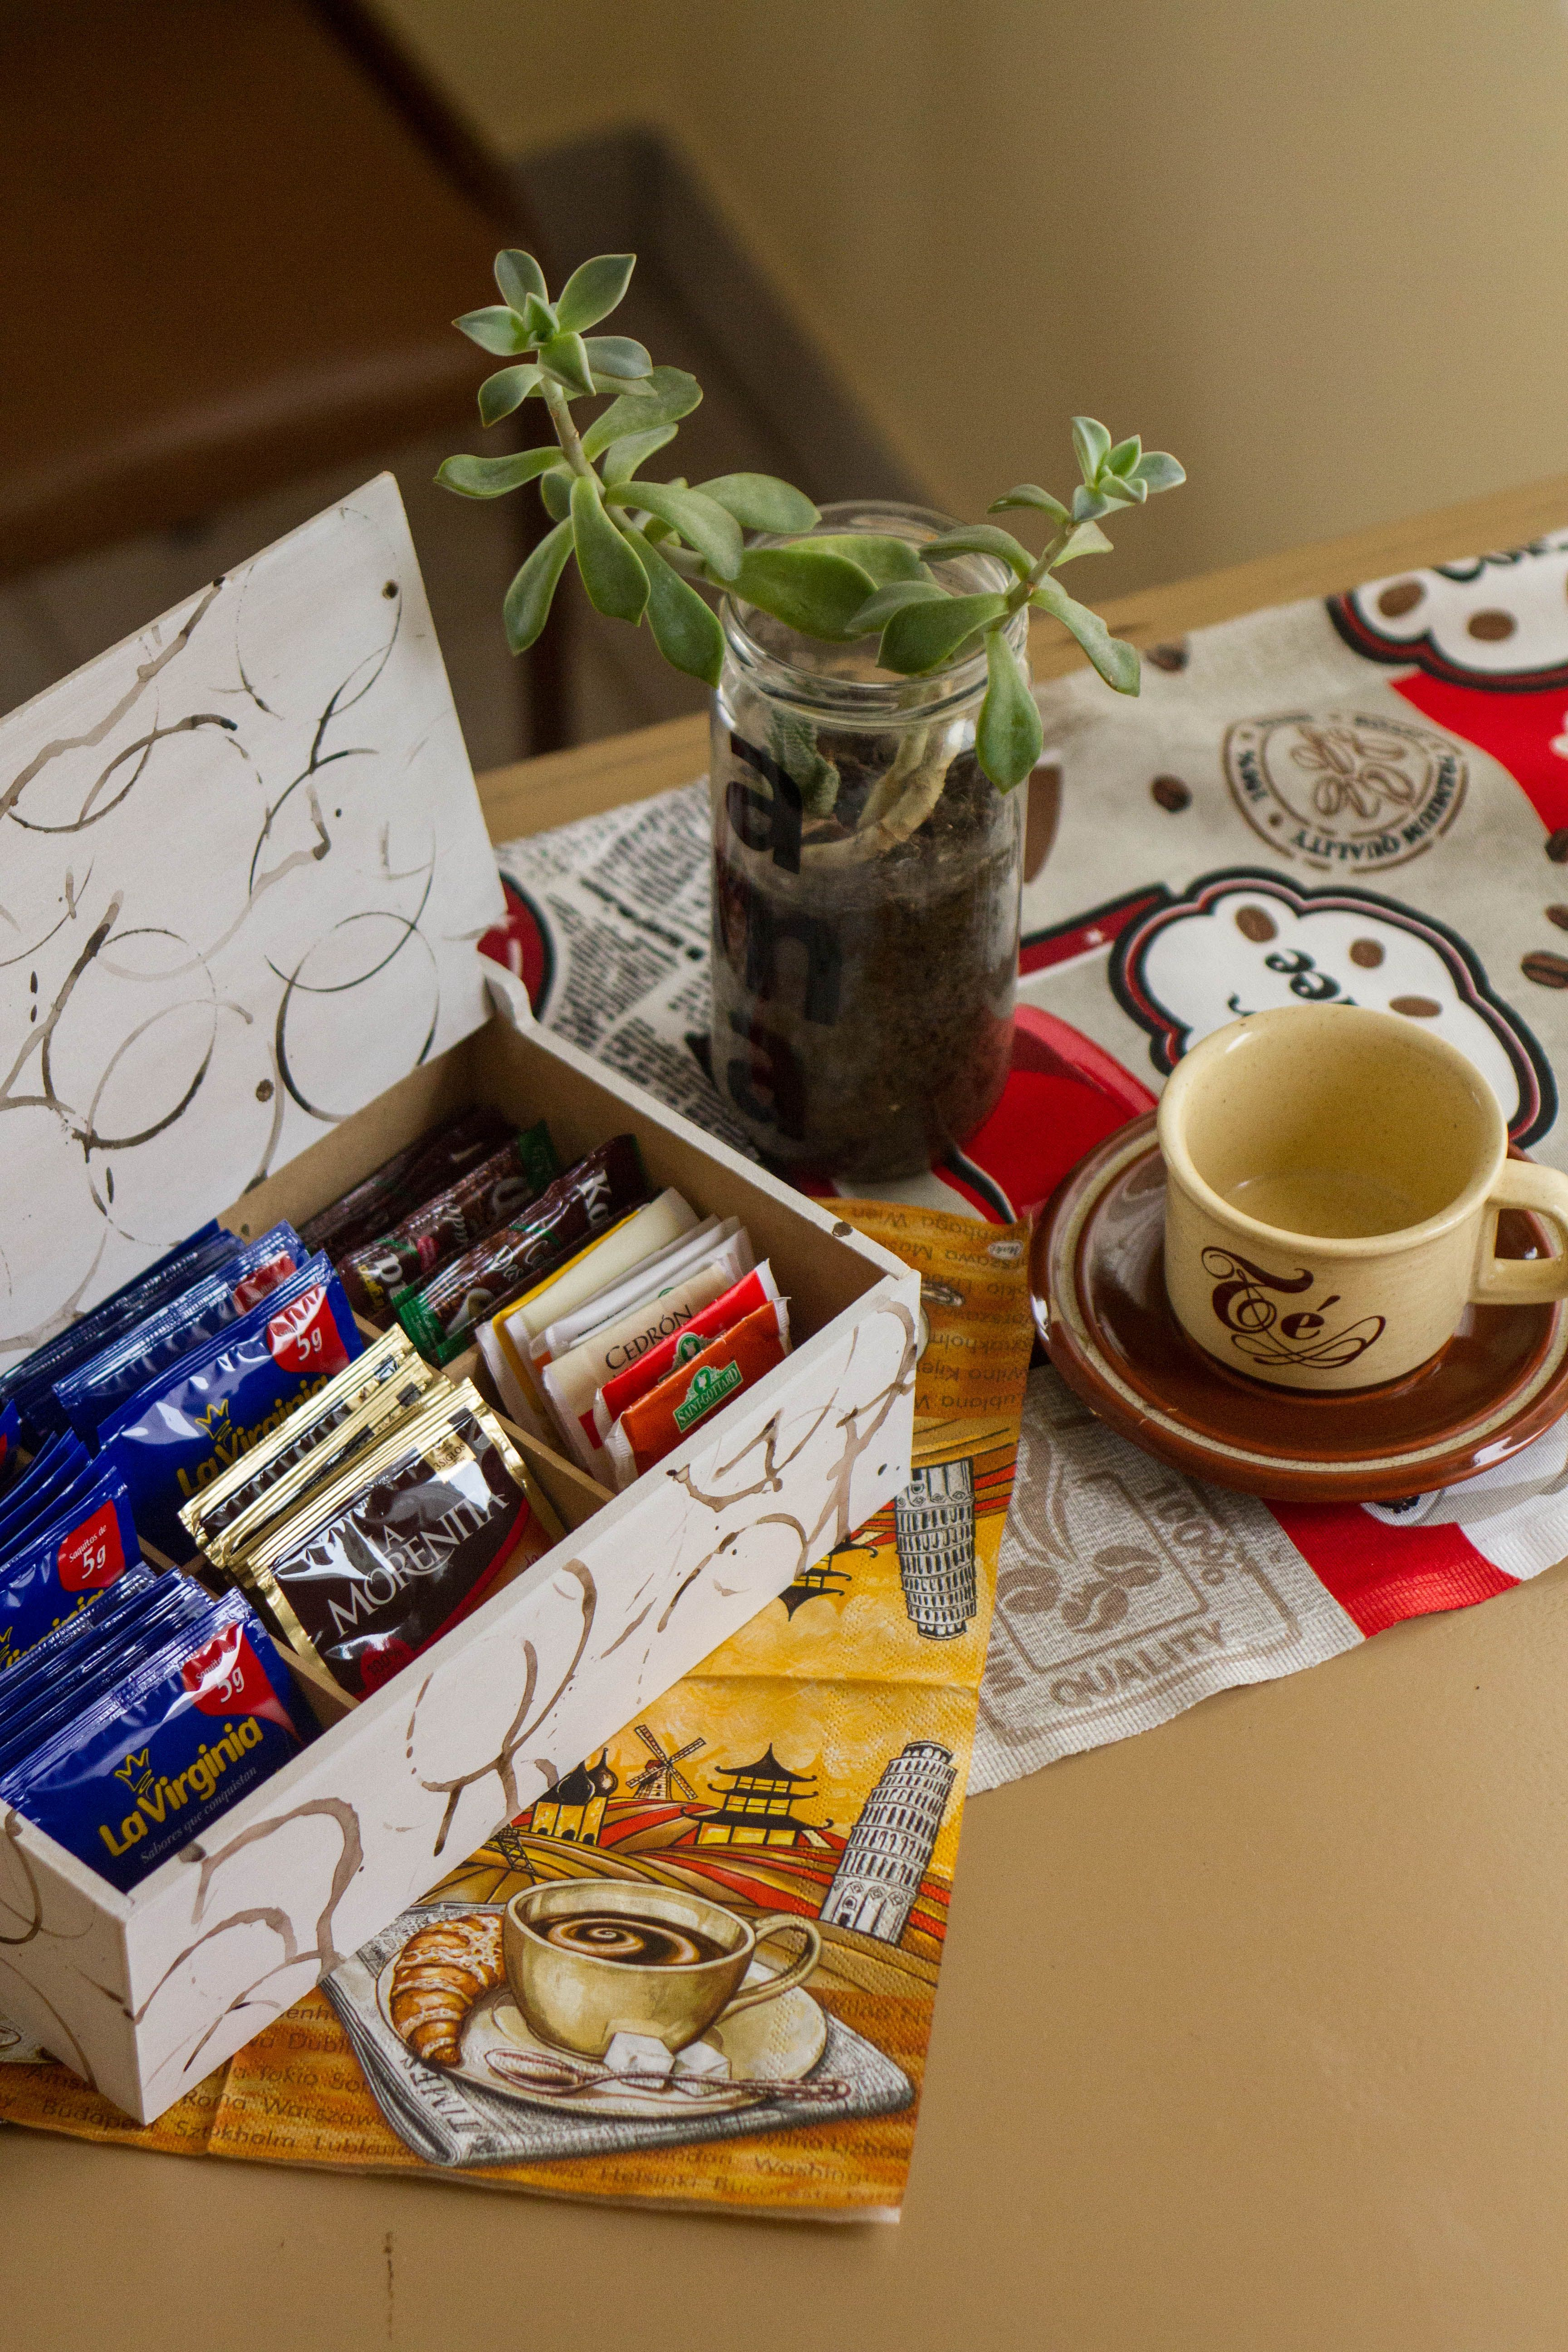 Coffee Tea Box.  Docupage technic with fabric. Watercolor.  Café. Cajita para sobrecitos de café/té con técnica de decoupage con tela y patrón de acuarelas.